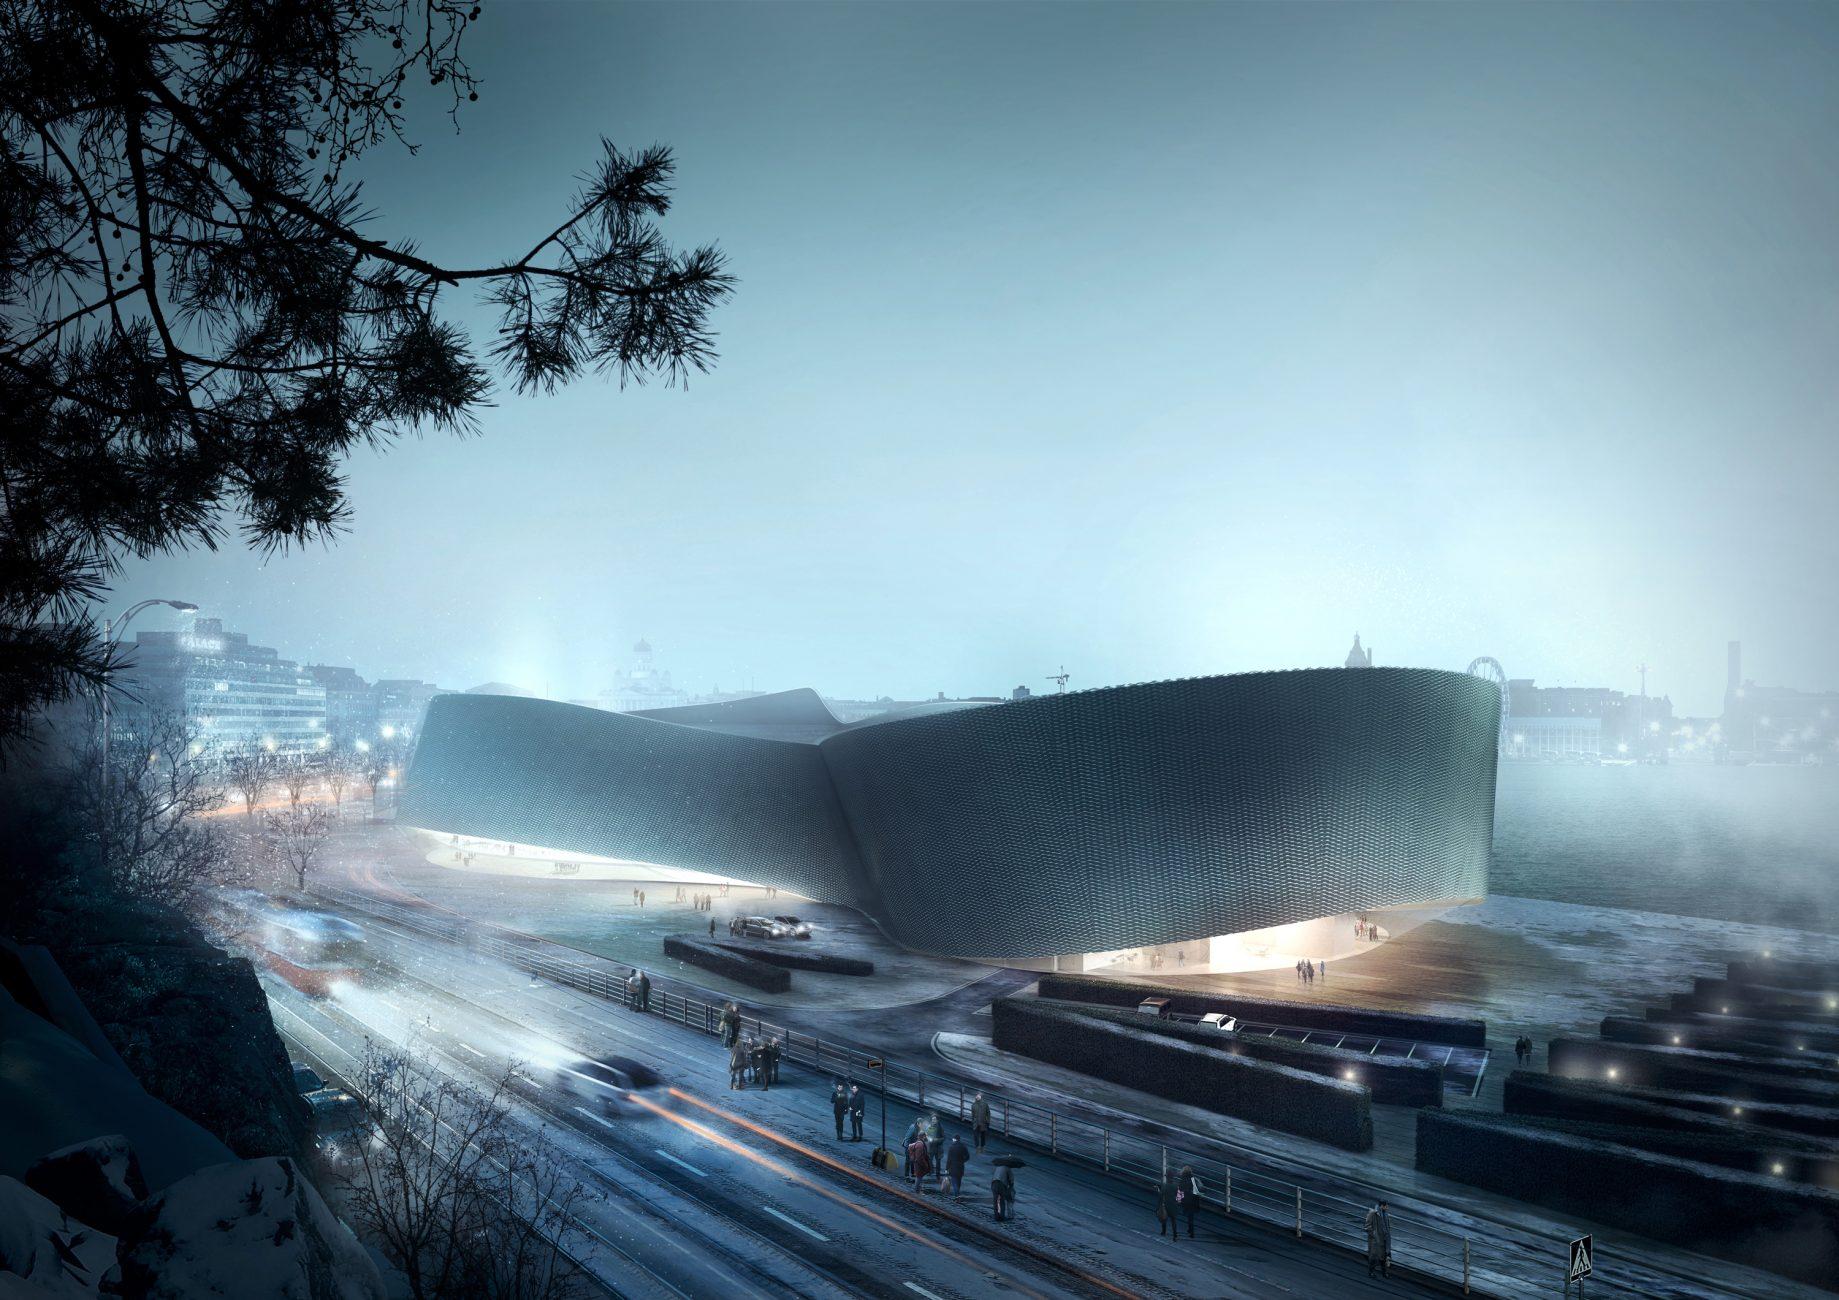 Guggenheim Helsinki by Plus3 Architects